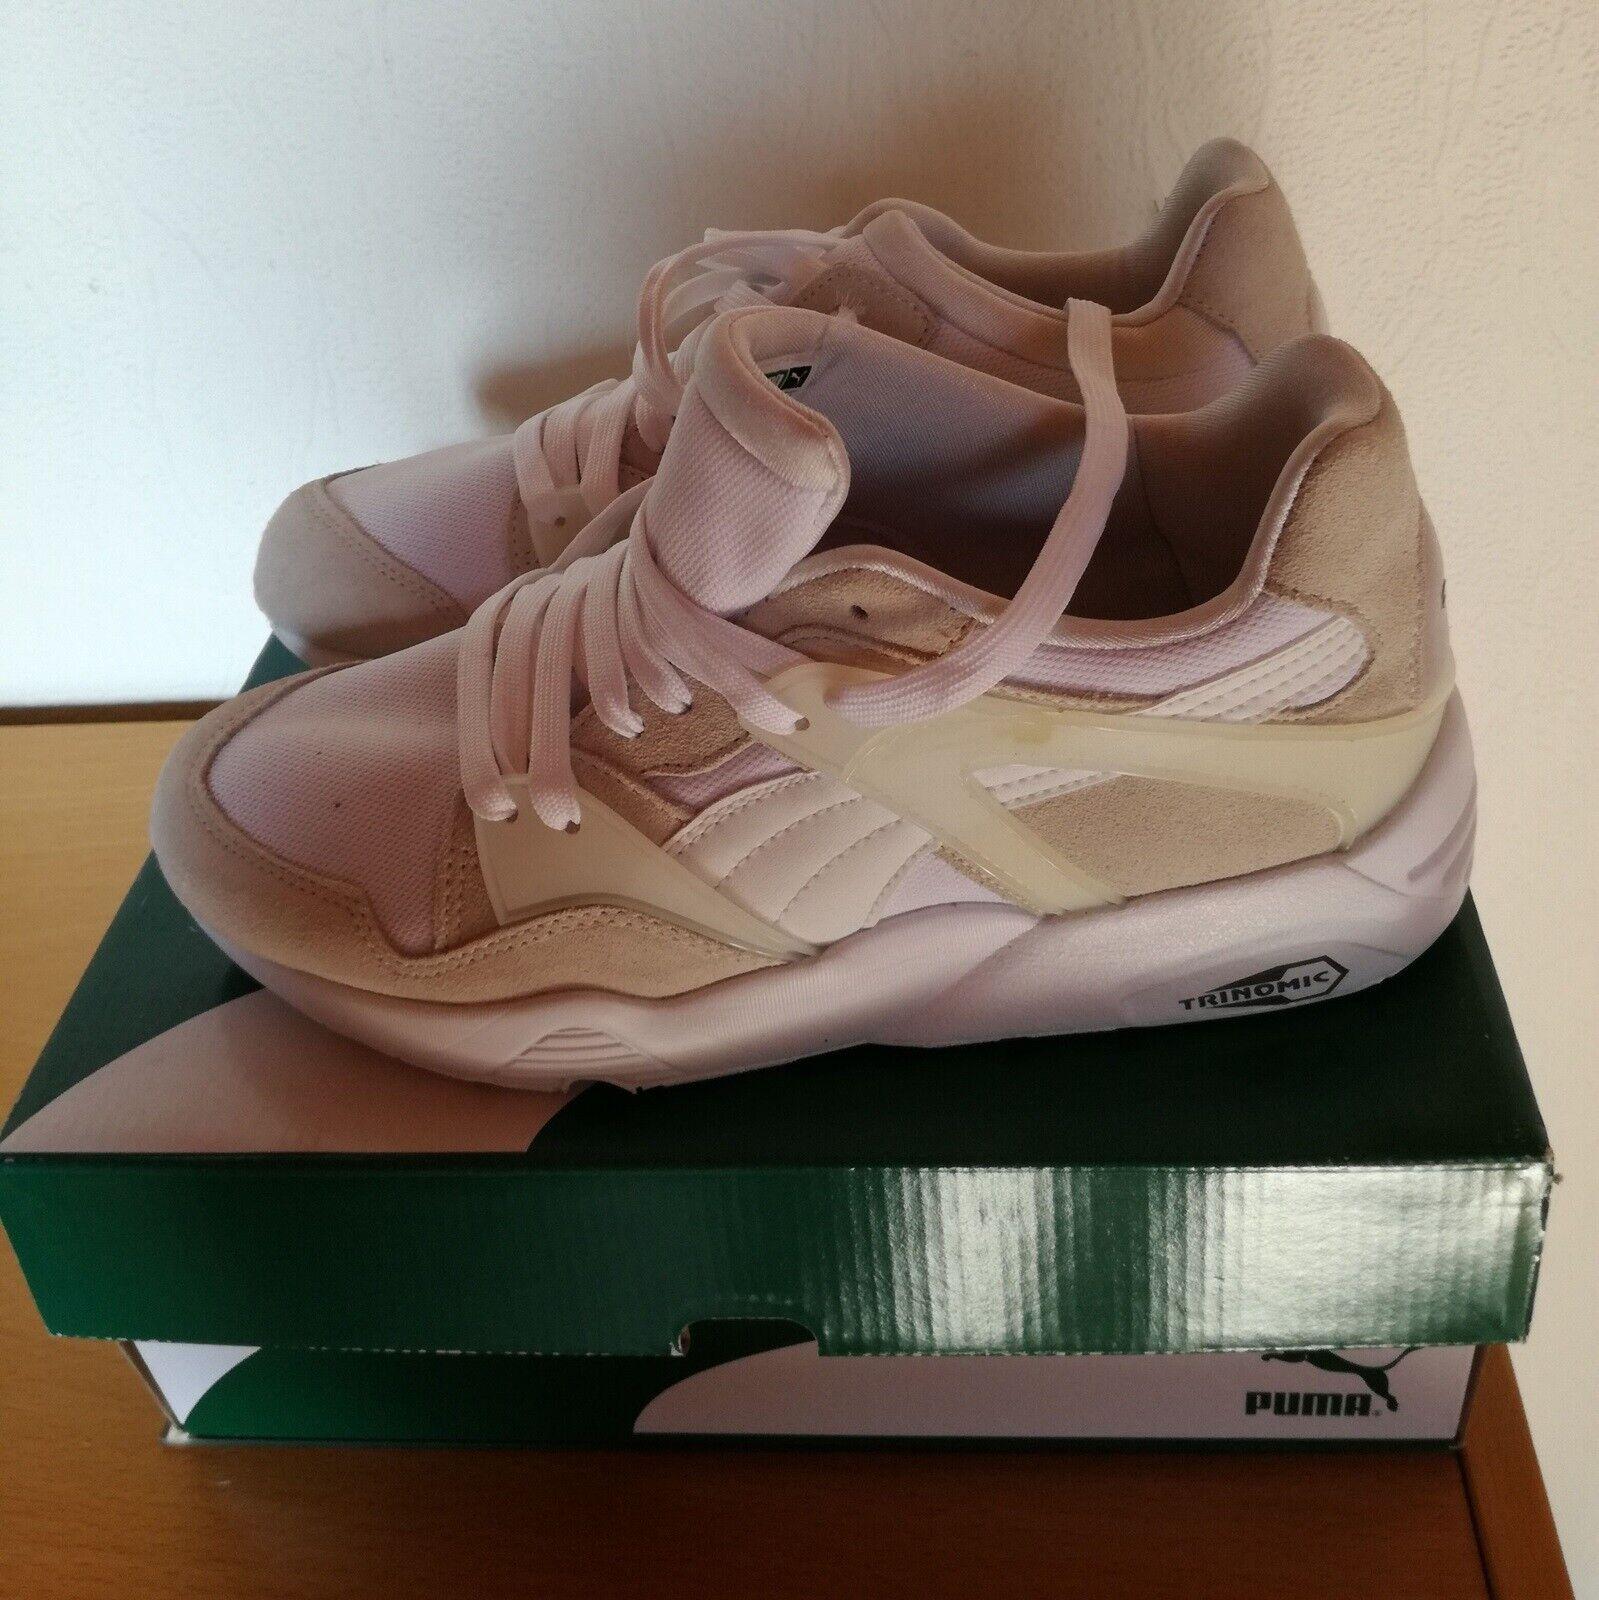 Løbesko, Sports sko, Puma Trinomec